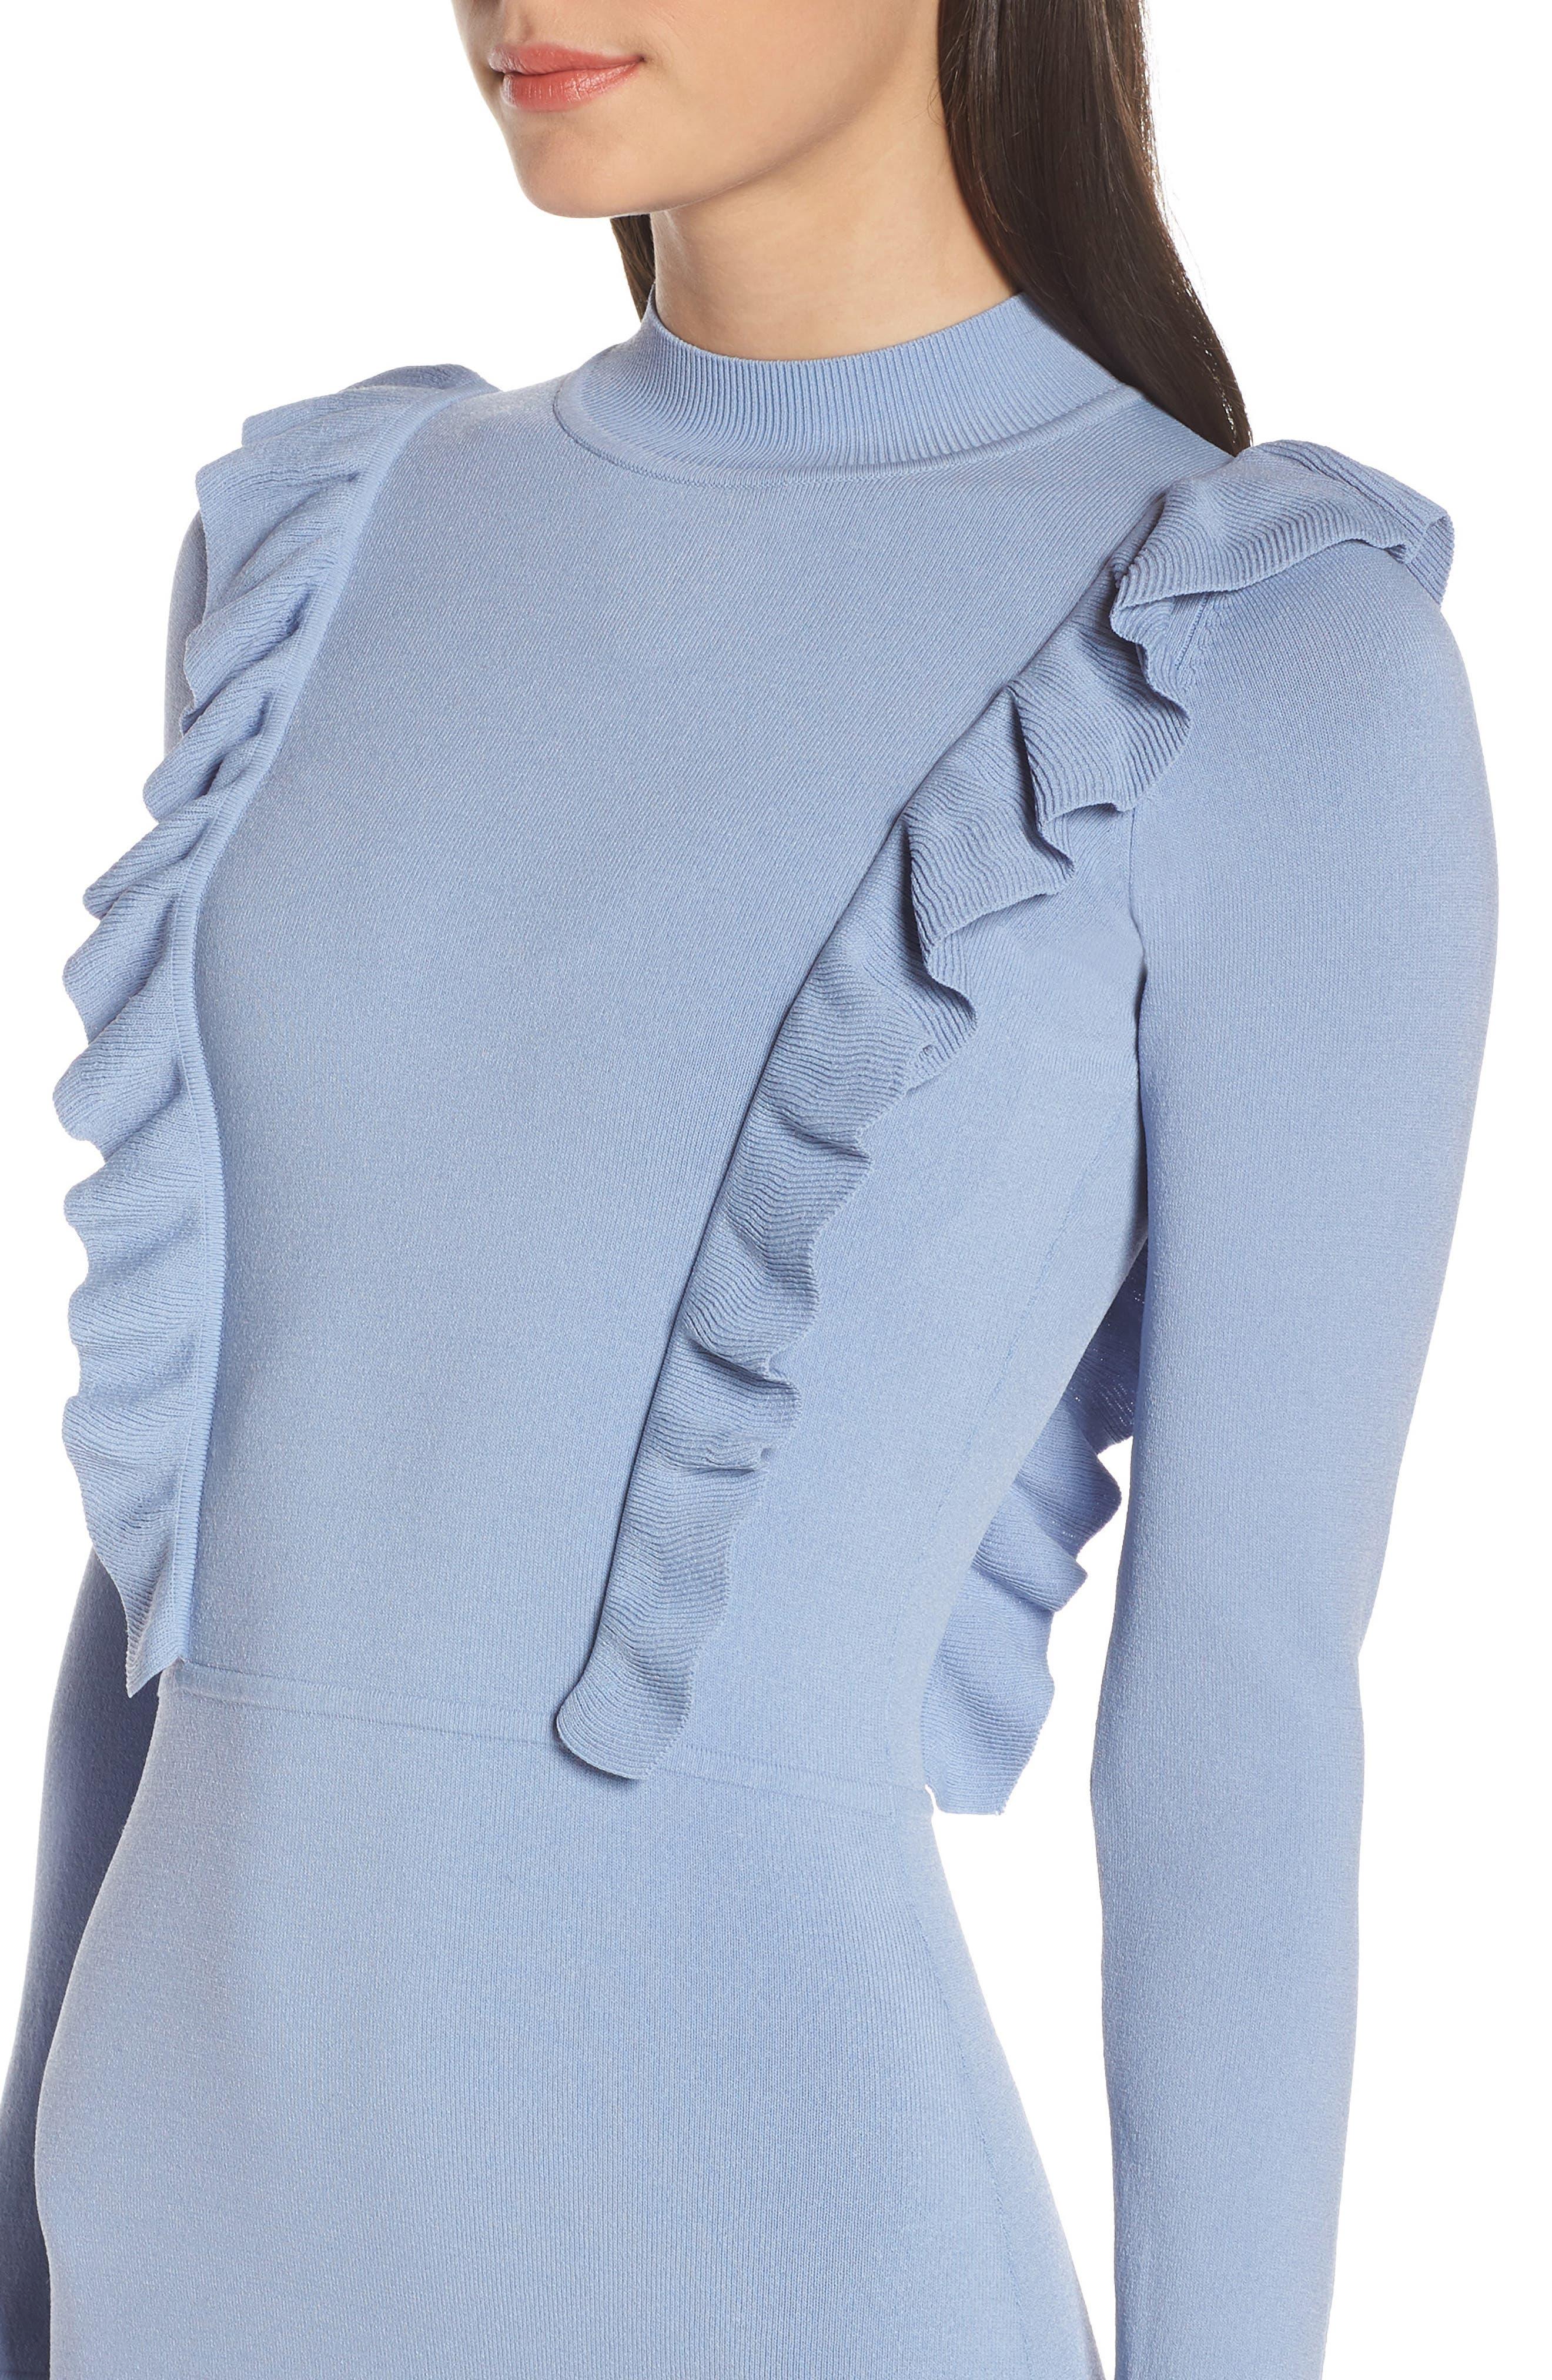 Rose Garden Sweater Dress,                             Alternate thumbnail 4, color,                             CHAMBRAY